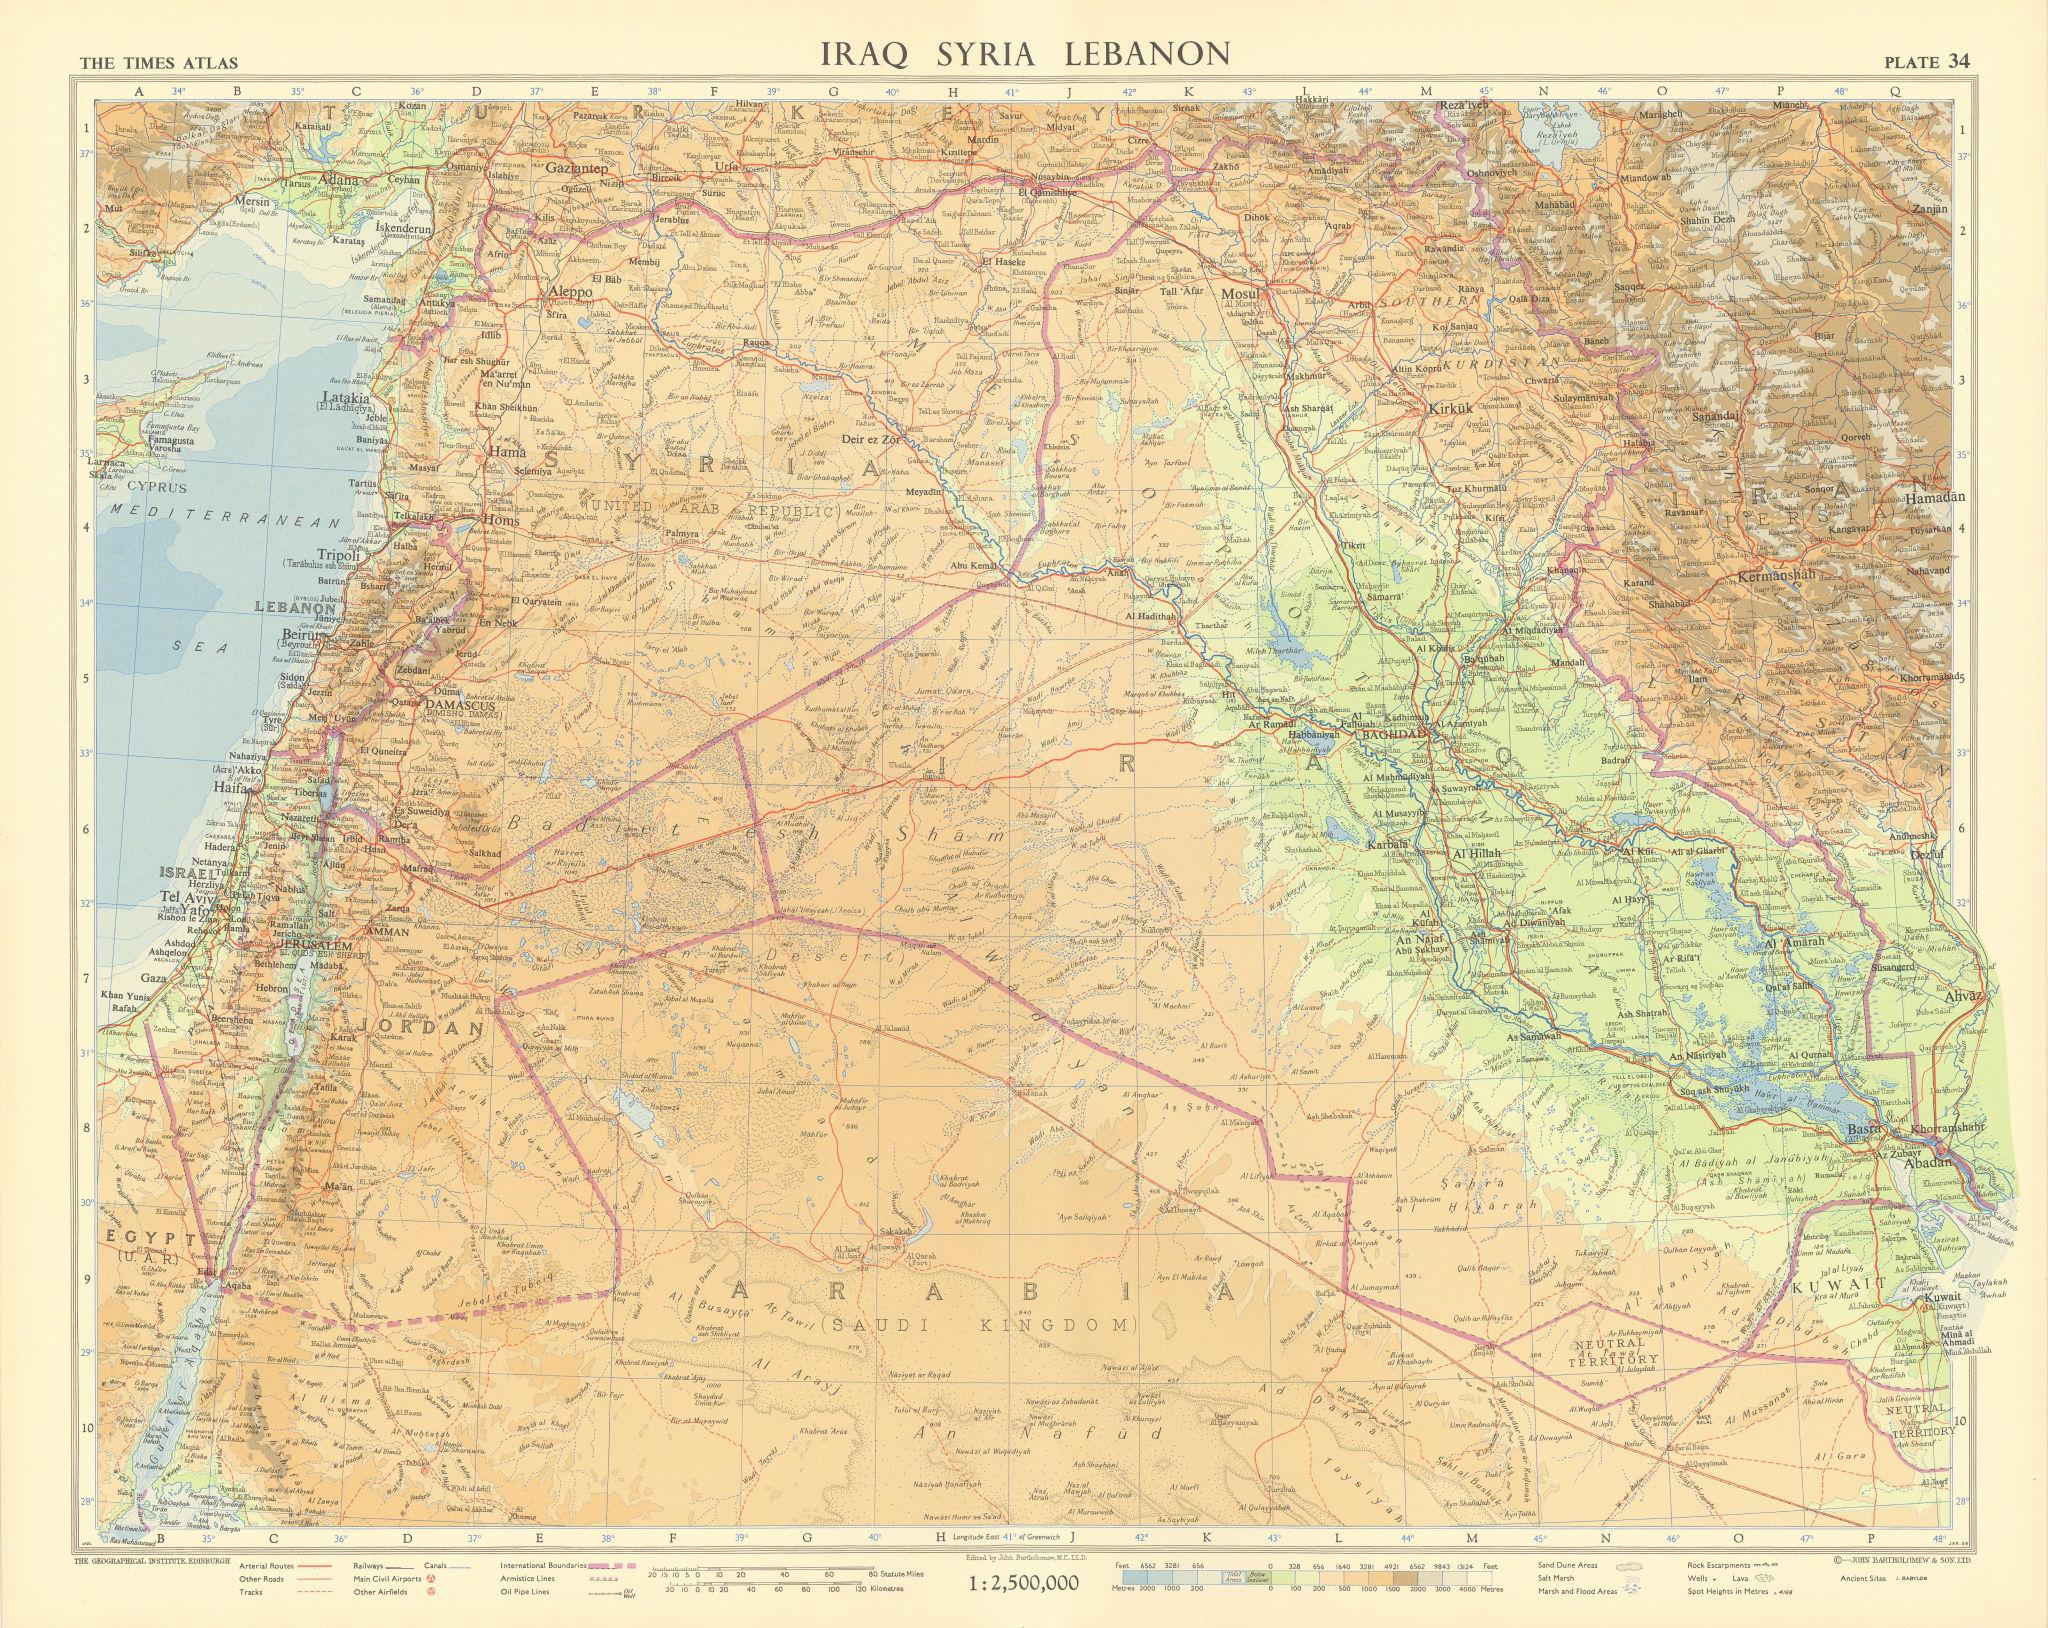 Middle East & Levant. Iraq Syria Lebanon Jordan Israel Arabia. TIMES 1959 map